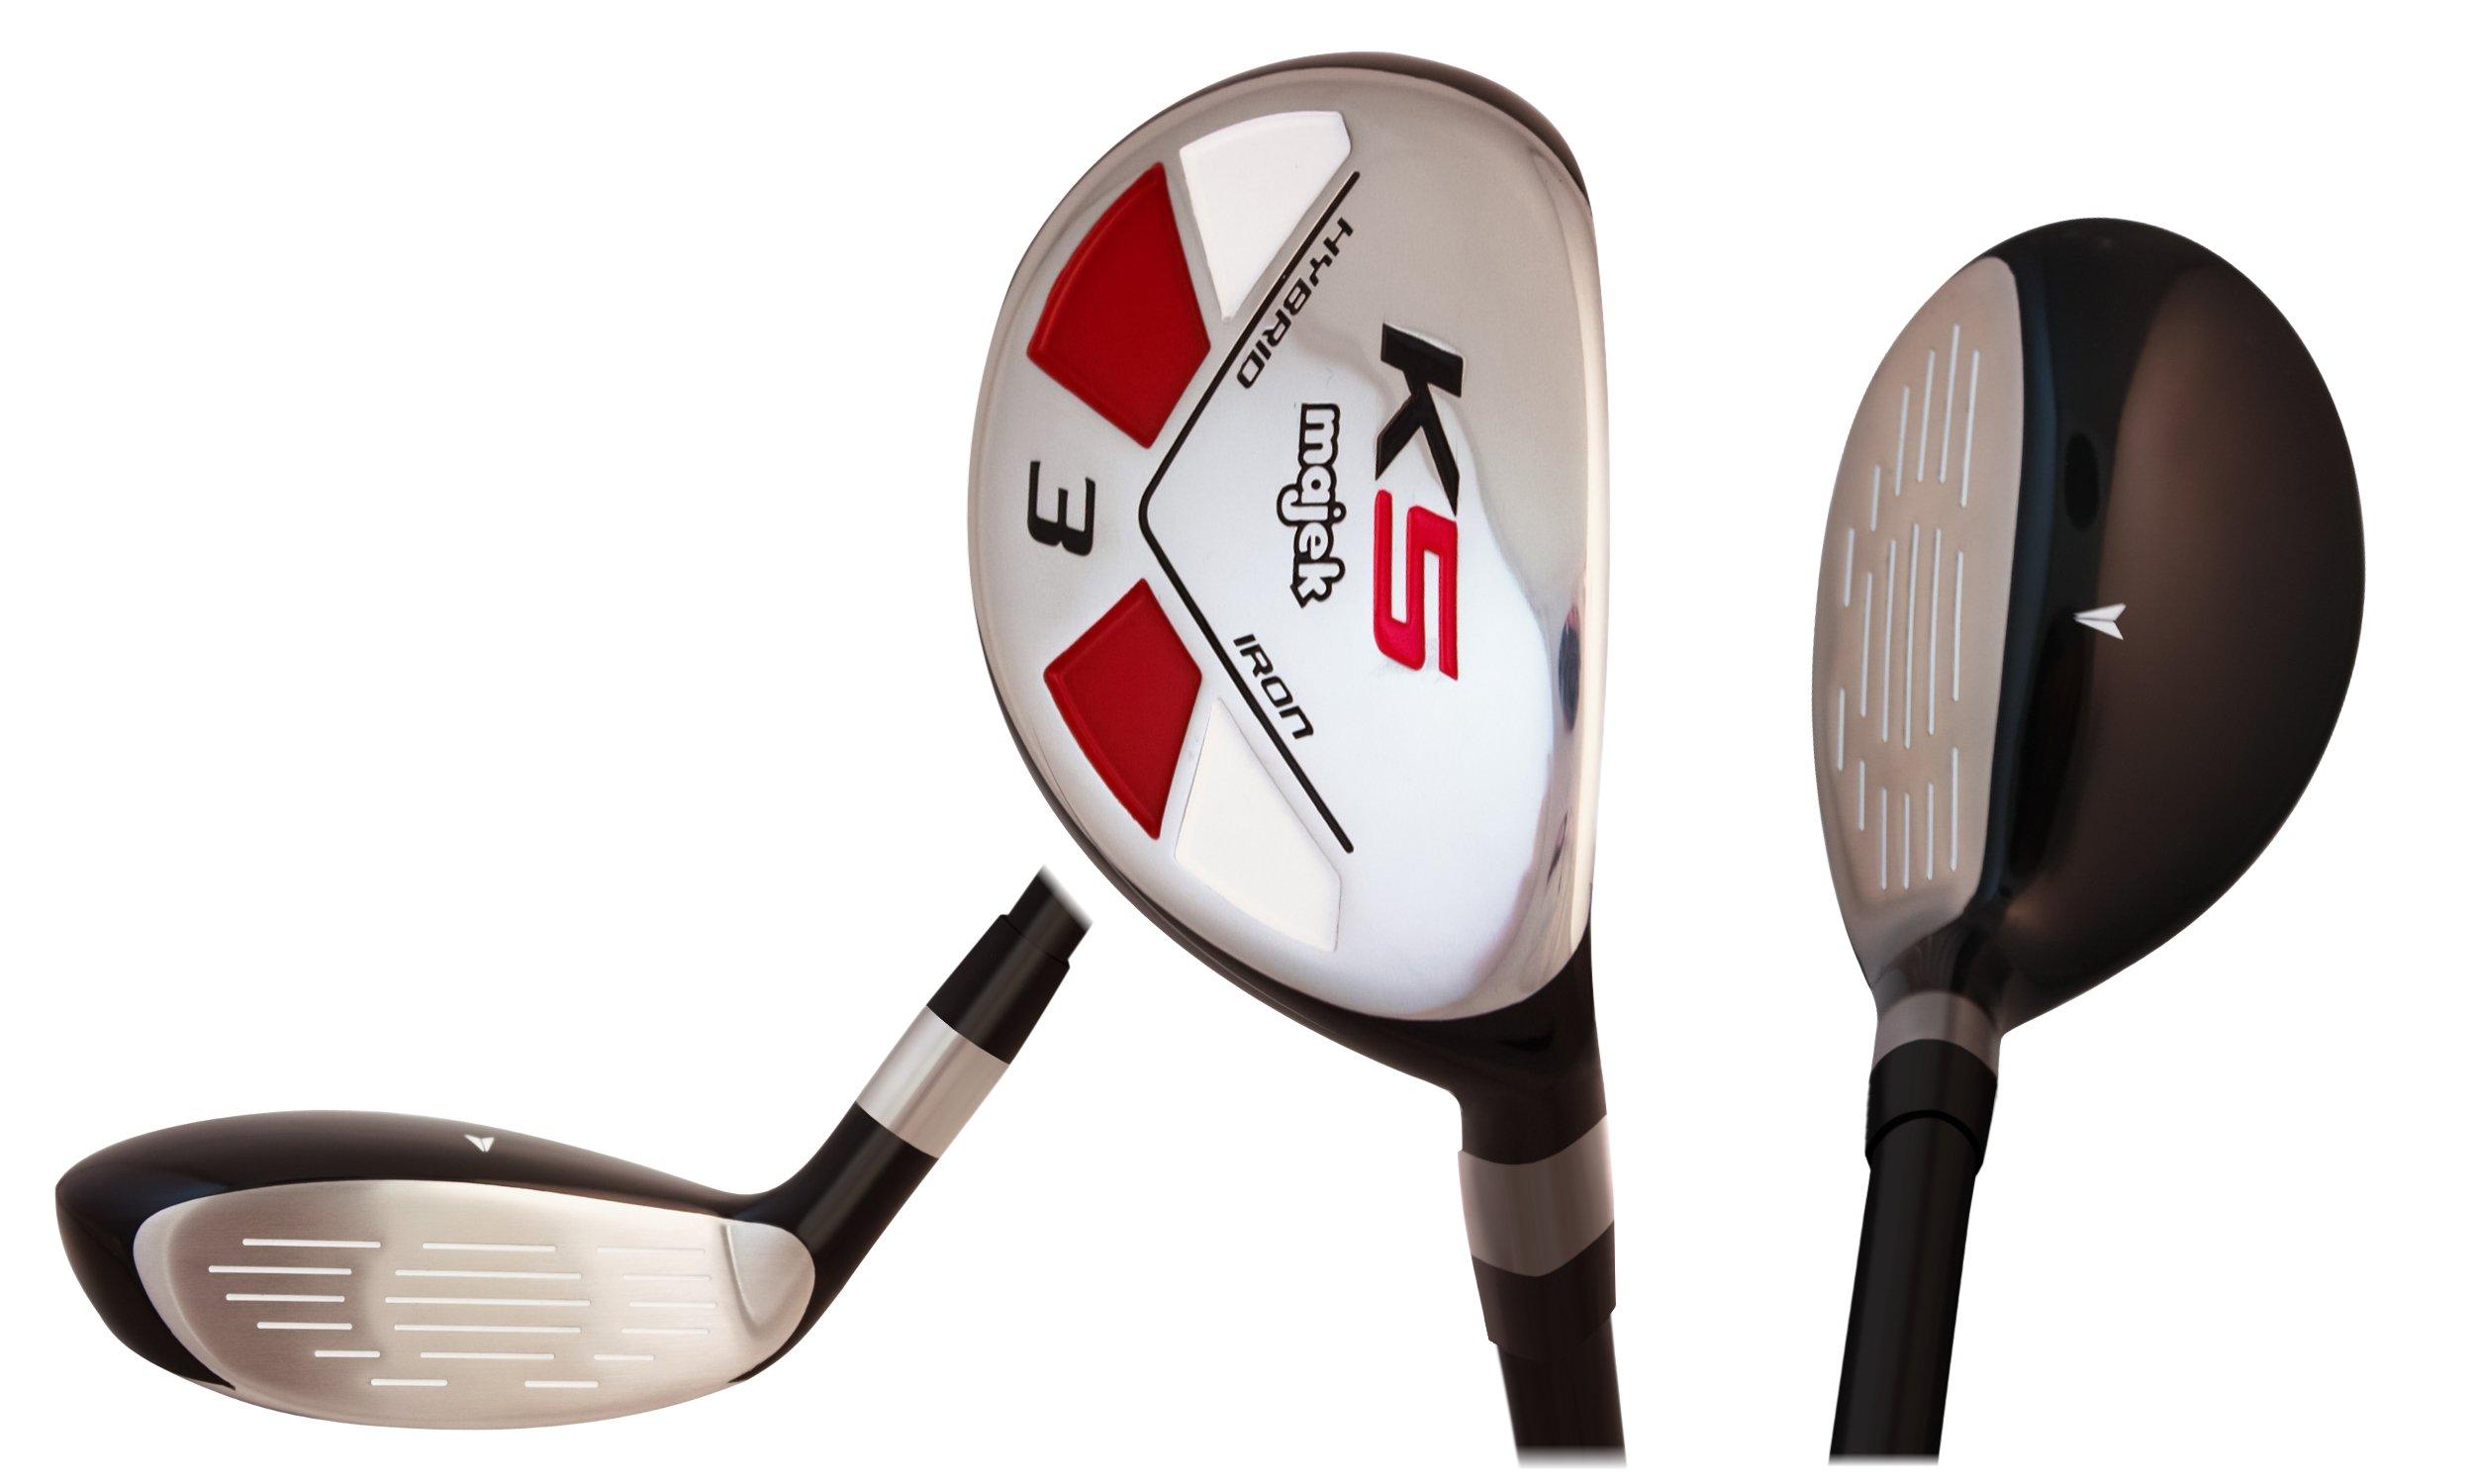 Majek Golf Petite Senior Lady #3 Hybrid Lady Flex Right Handed New Rescue Utility ''L'' Flex Club (Petite - 5' to 5'3'') with Tacki-Mac Arthritic Grip